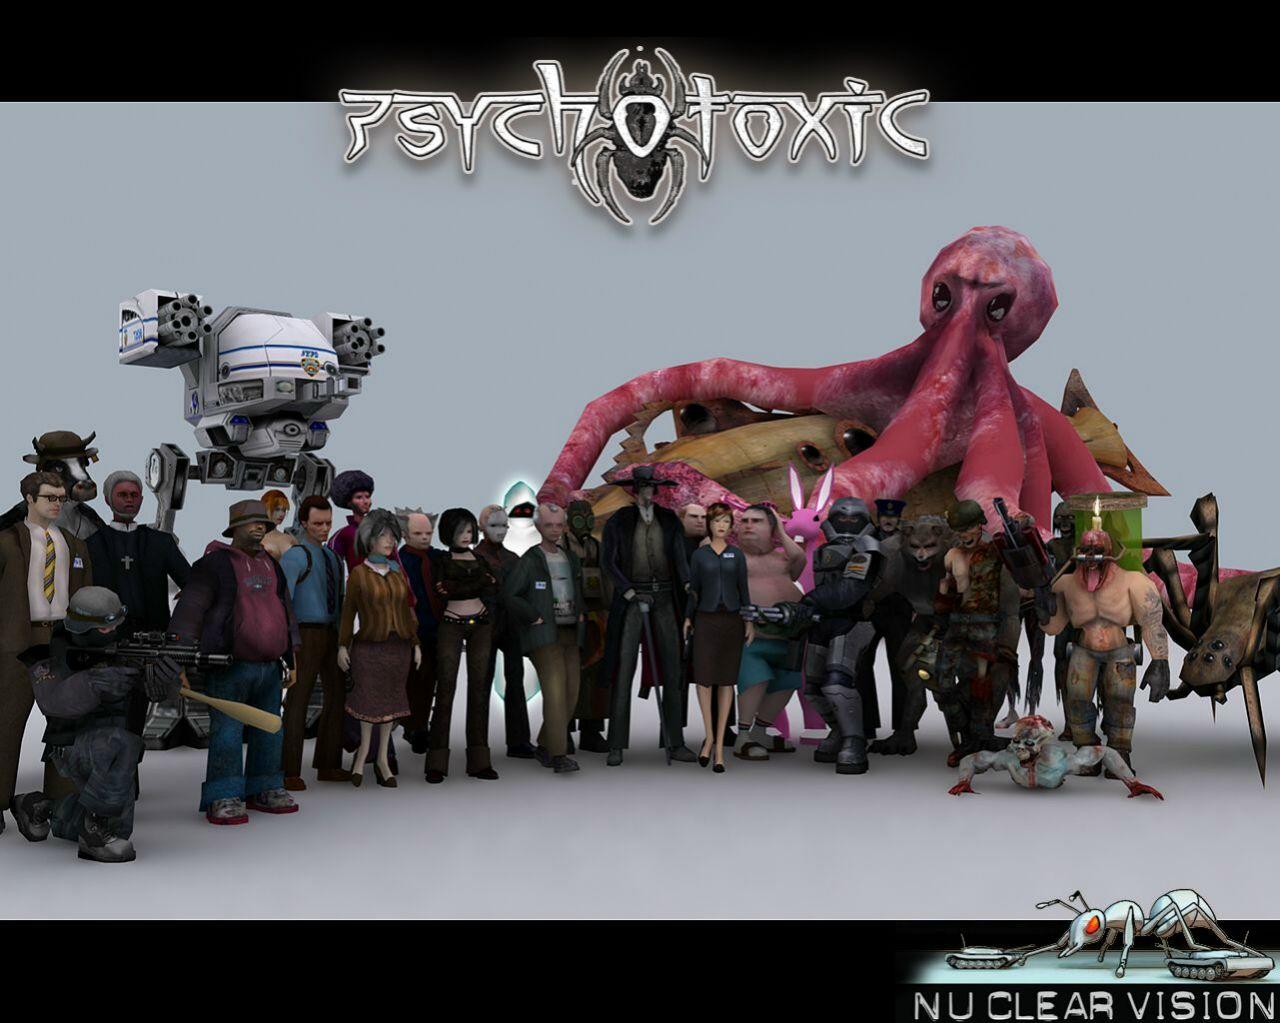 psychotxic3 1280